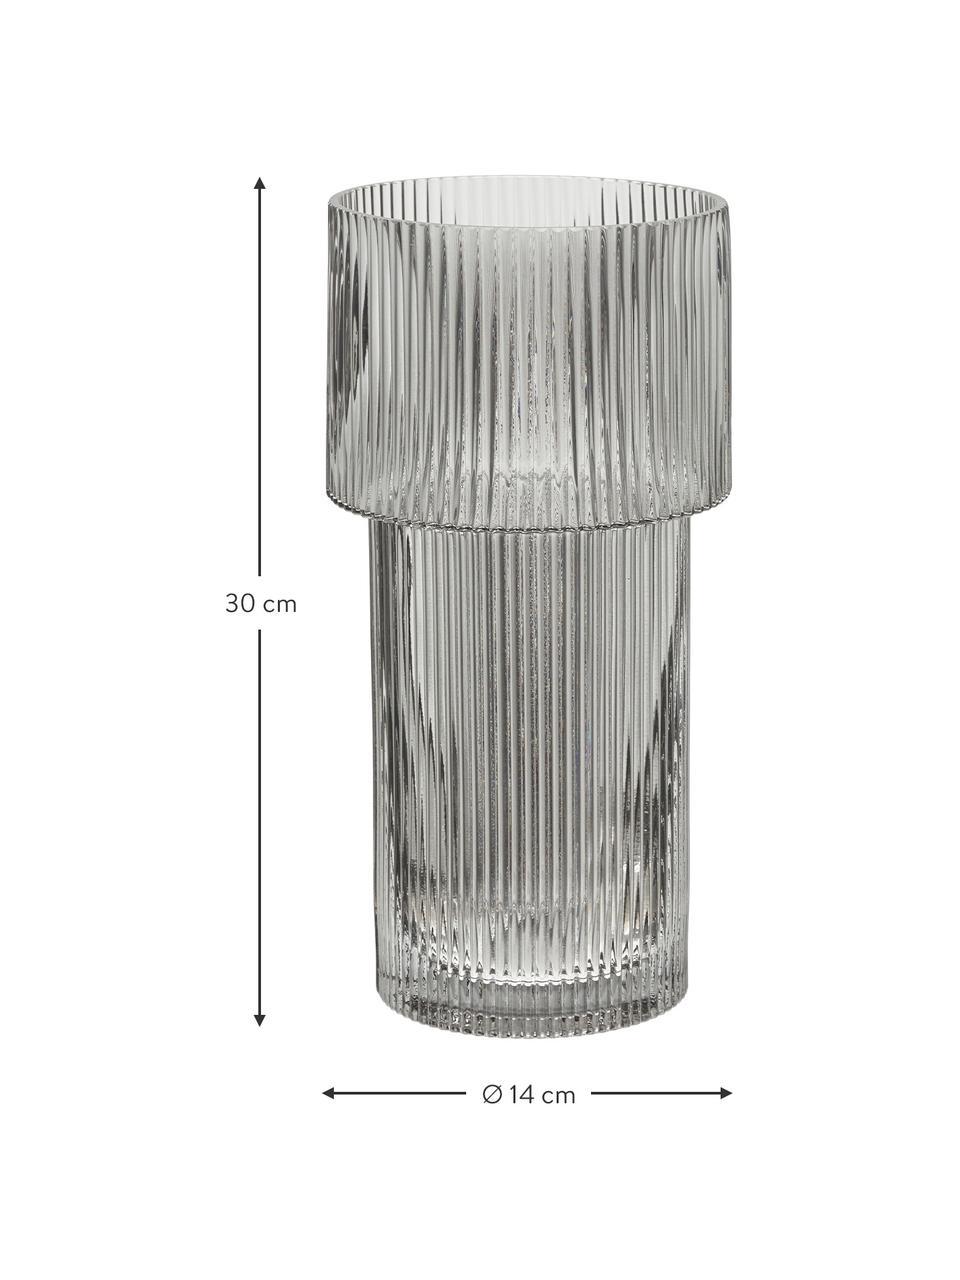 Glas-Vase Lija, Glas, Grau, transparent, Ø 14 x H 30 cm